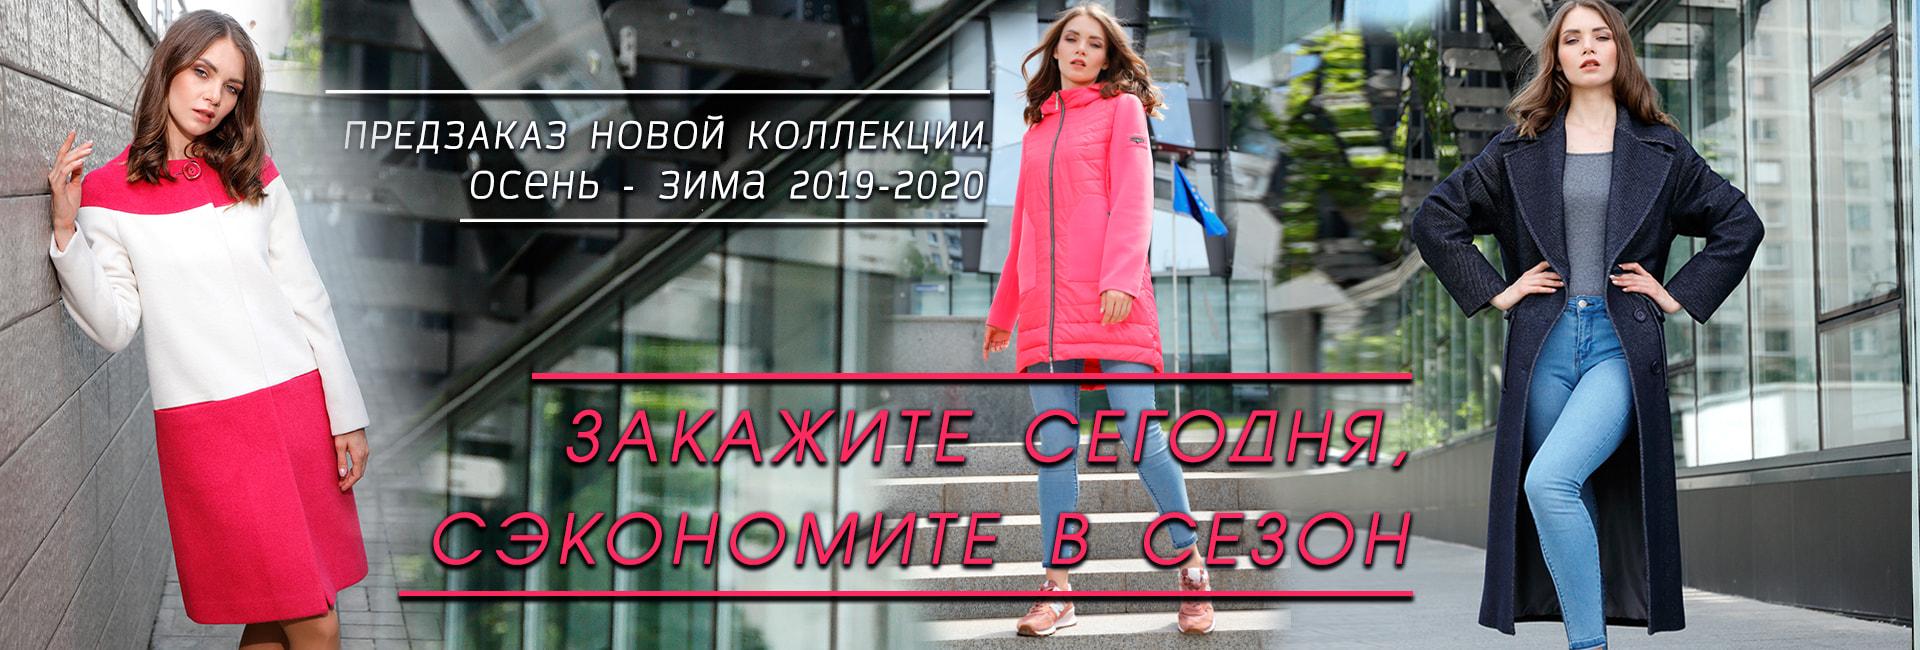 banner predzakaz2019 2 min Купить верхнюю одежду оптом